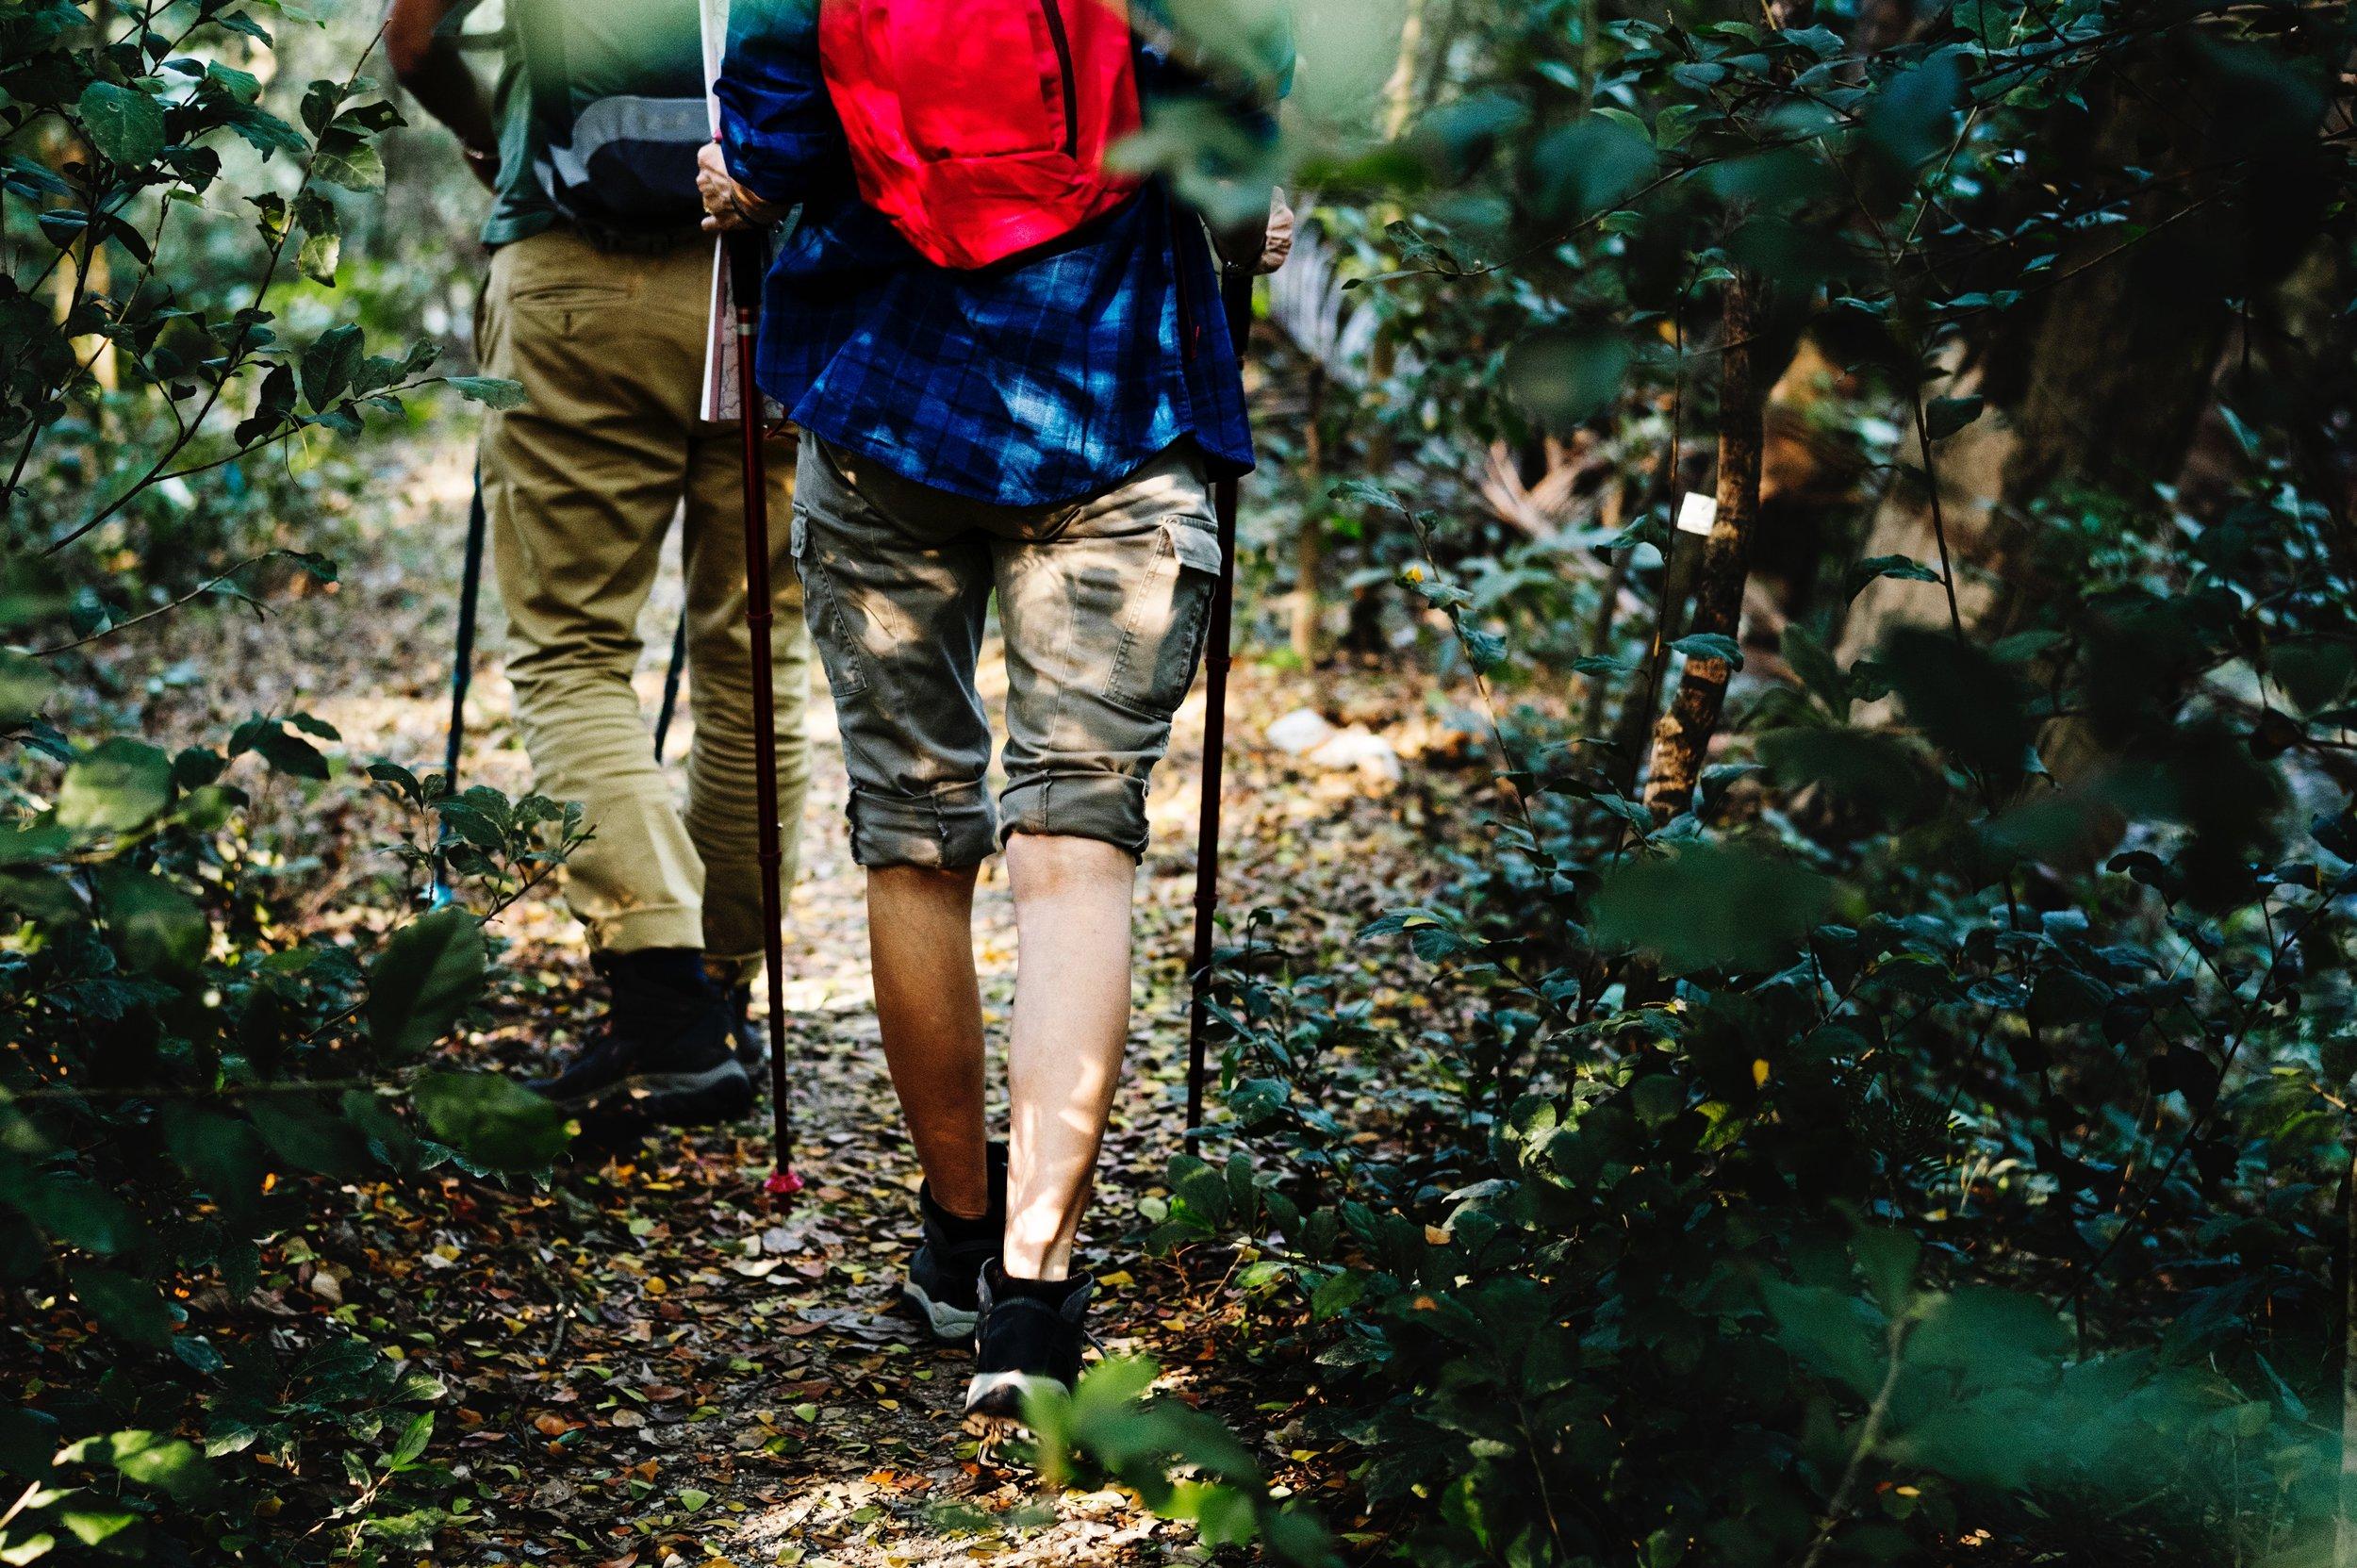 Hiking- activity-adults-adventure-1246955.jpg